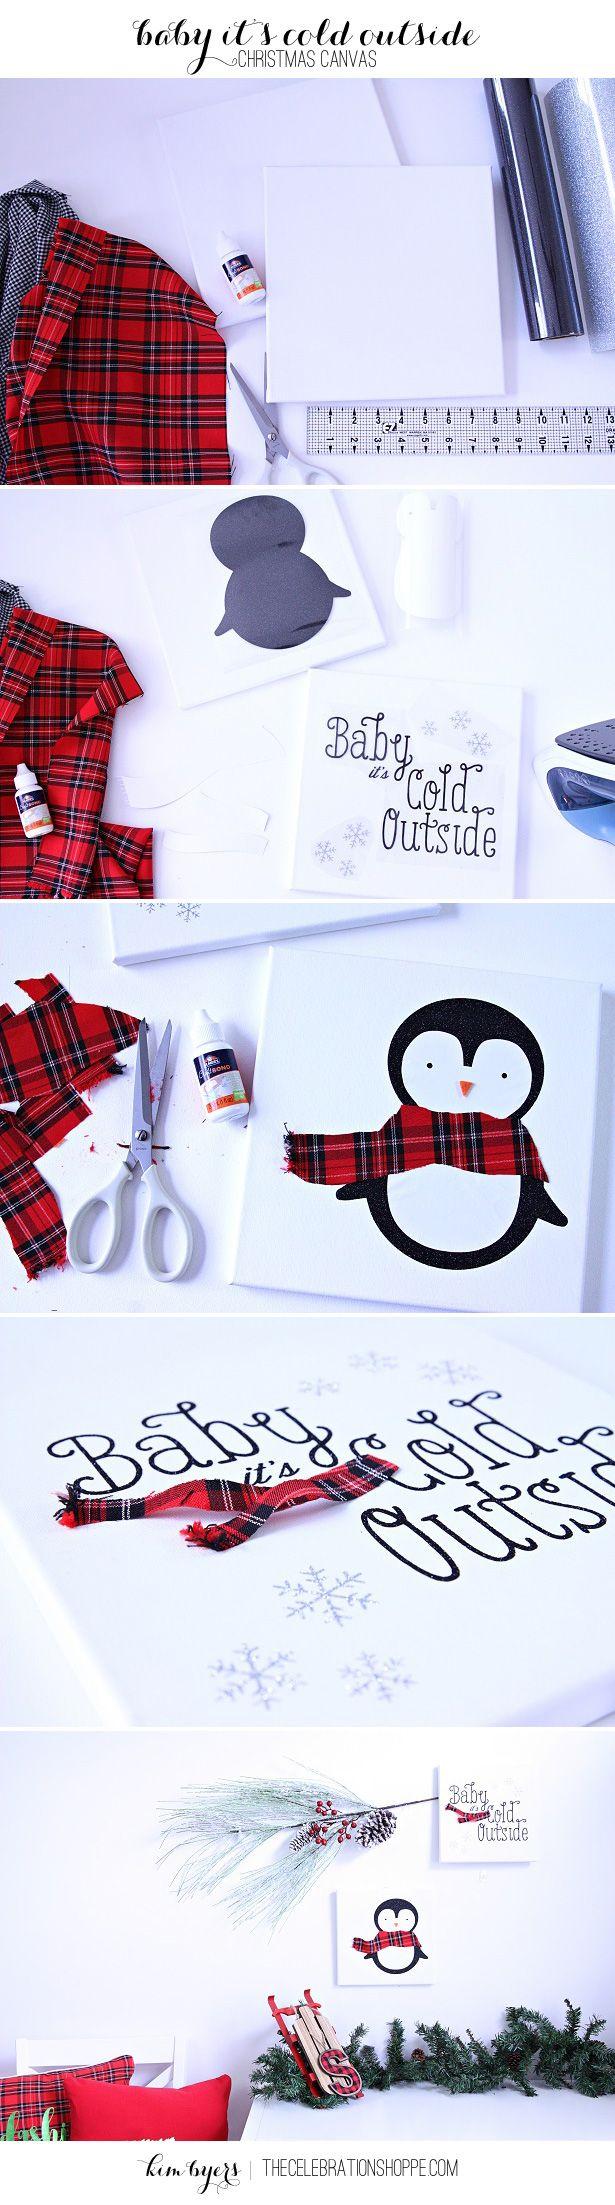 Make Plaid Christmas Crafts - Plaid is trending! Make plaid penguin Christmas crafts for your home this holiday. | Kim Byers